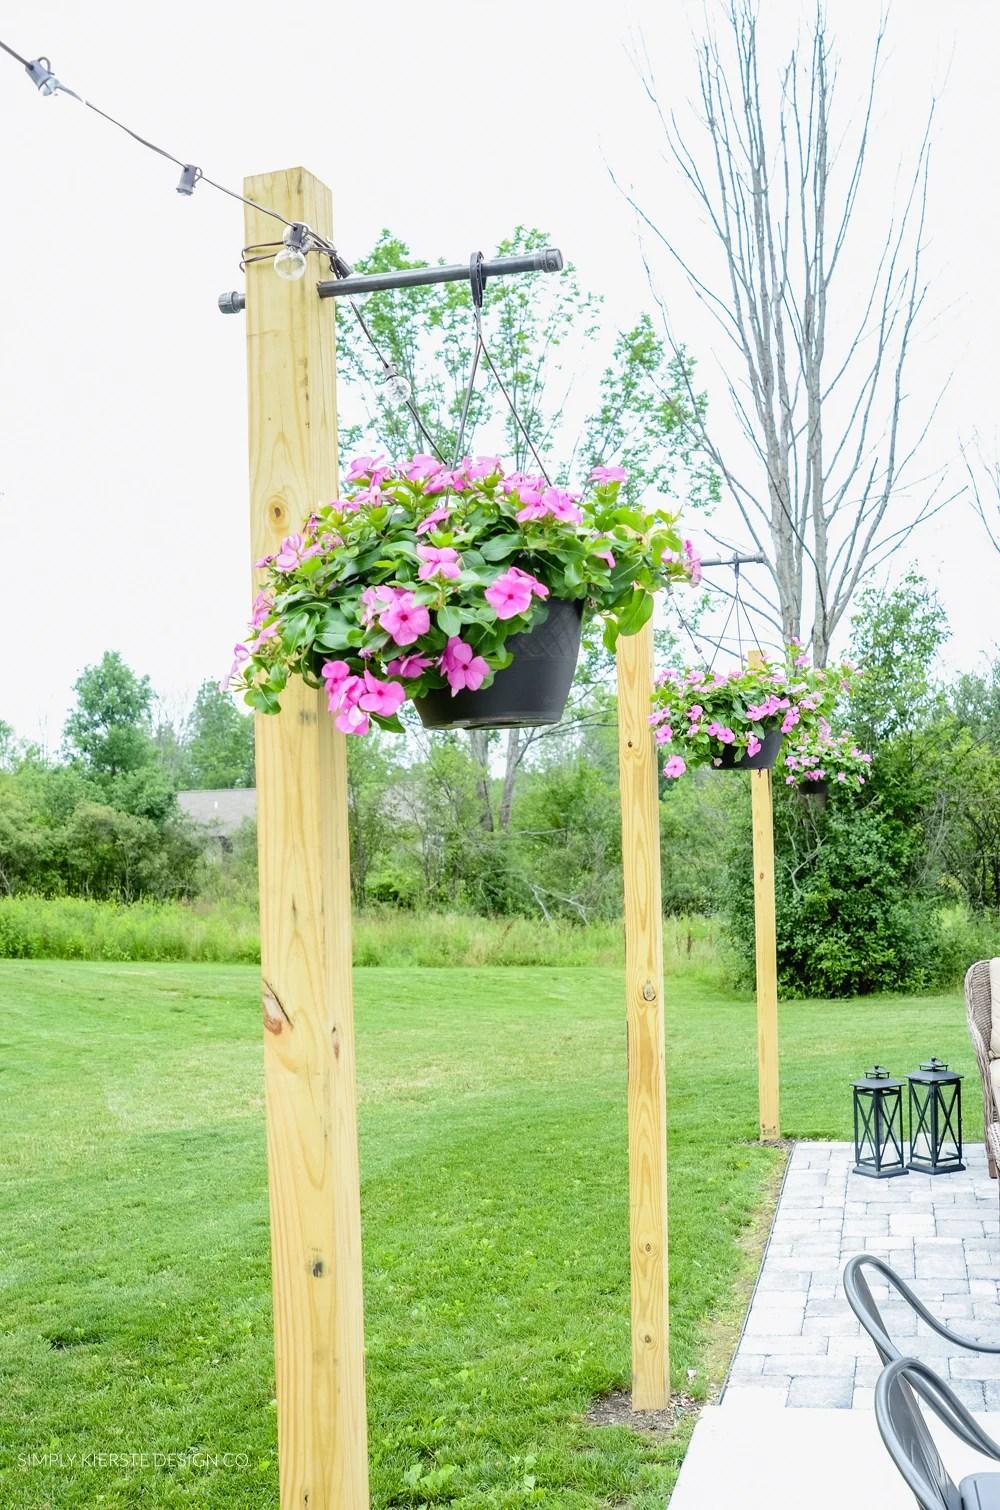 DIY Posts for Outdoor String Lights - Old Salt Farm on Backyard String Lights Diy  id=28303